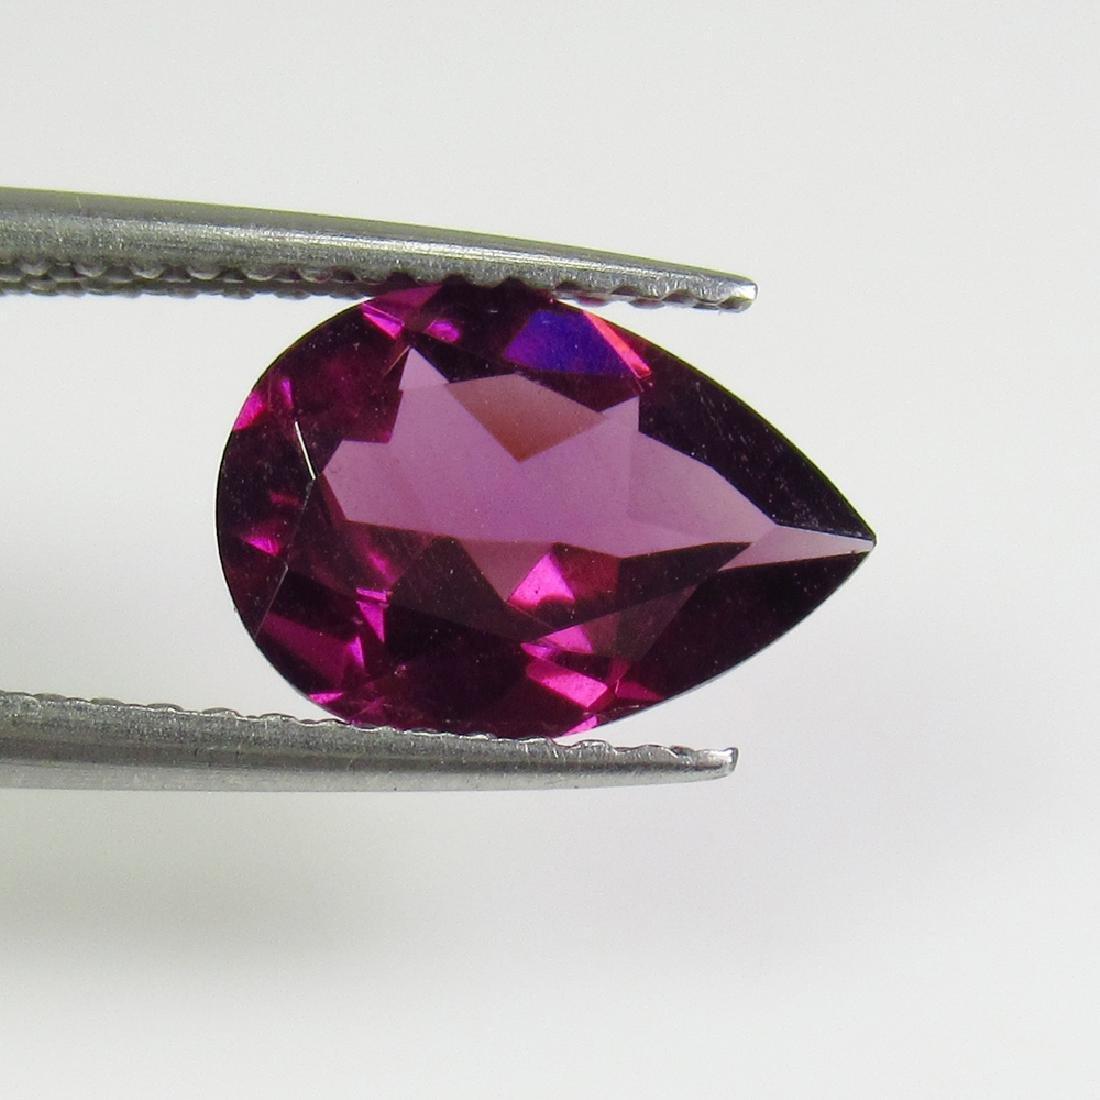 2.04 Ct Genuine Pink Rhodolite Garnet Pear Cut